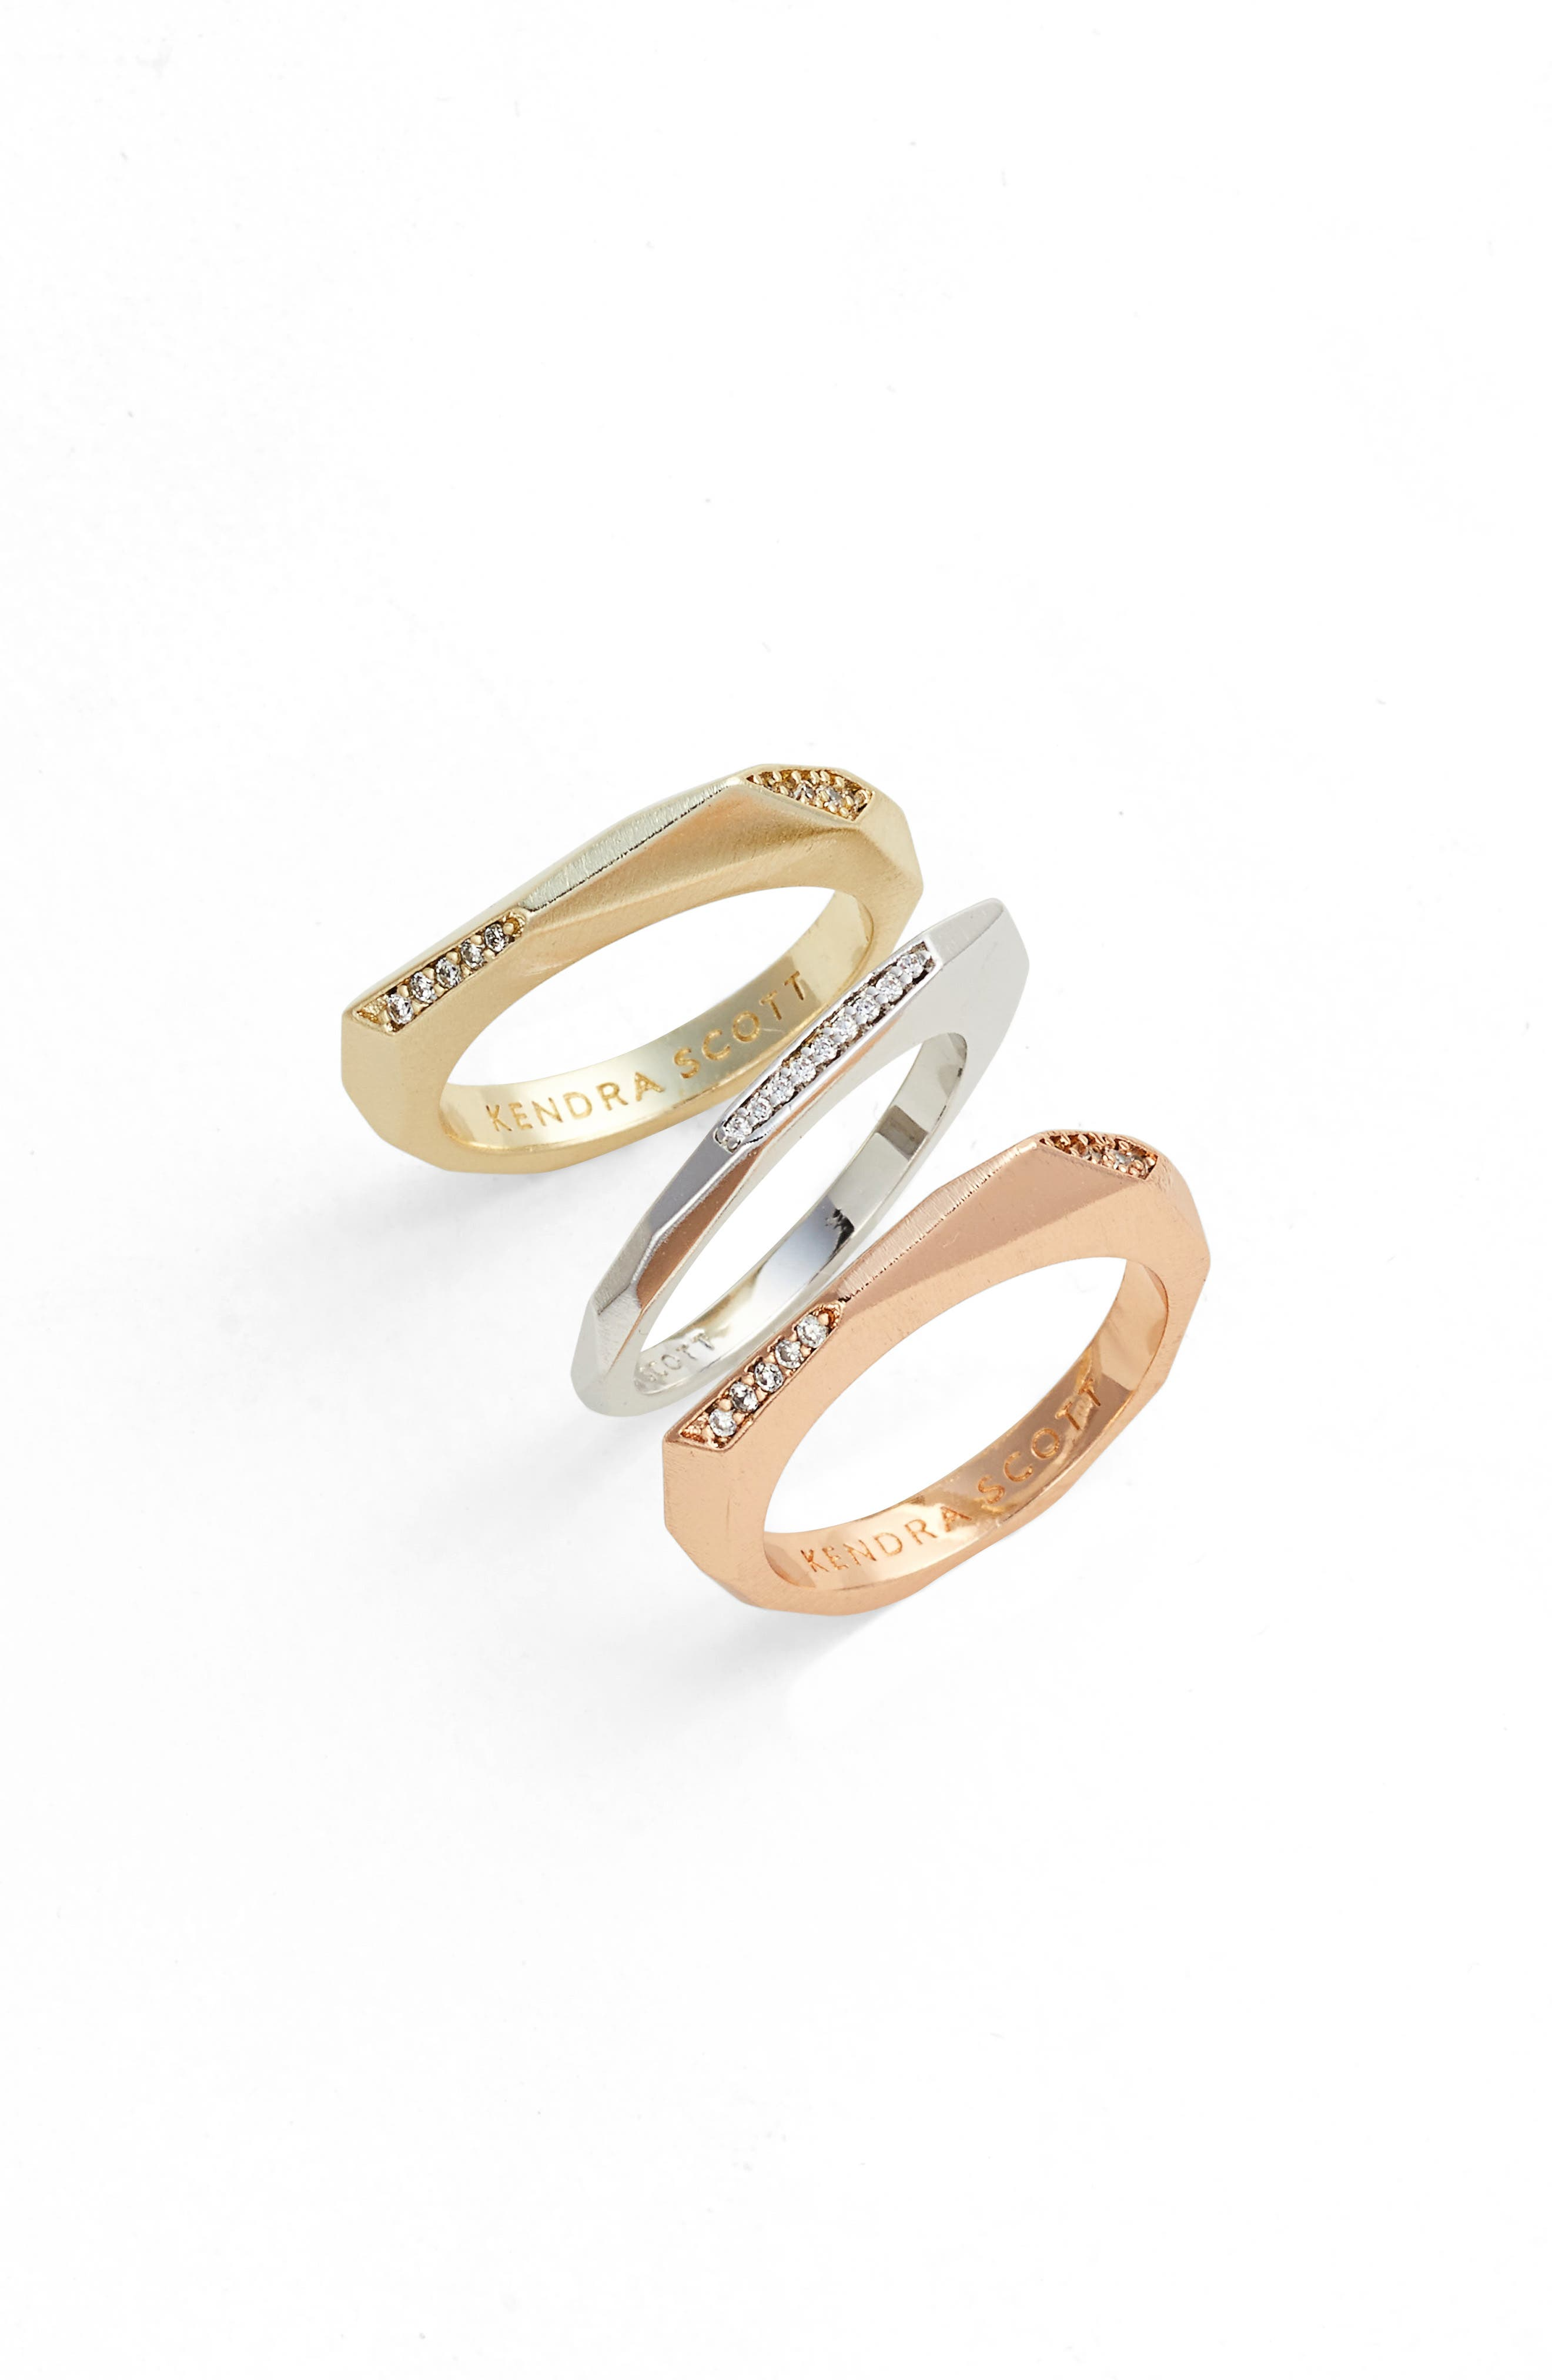 Kendra Scott Joel Stackable Rings